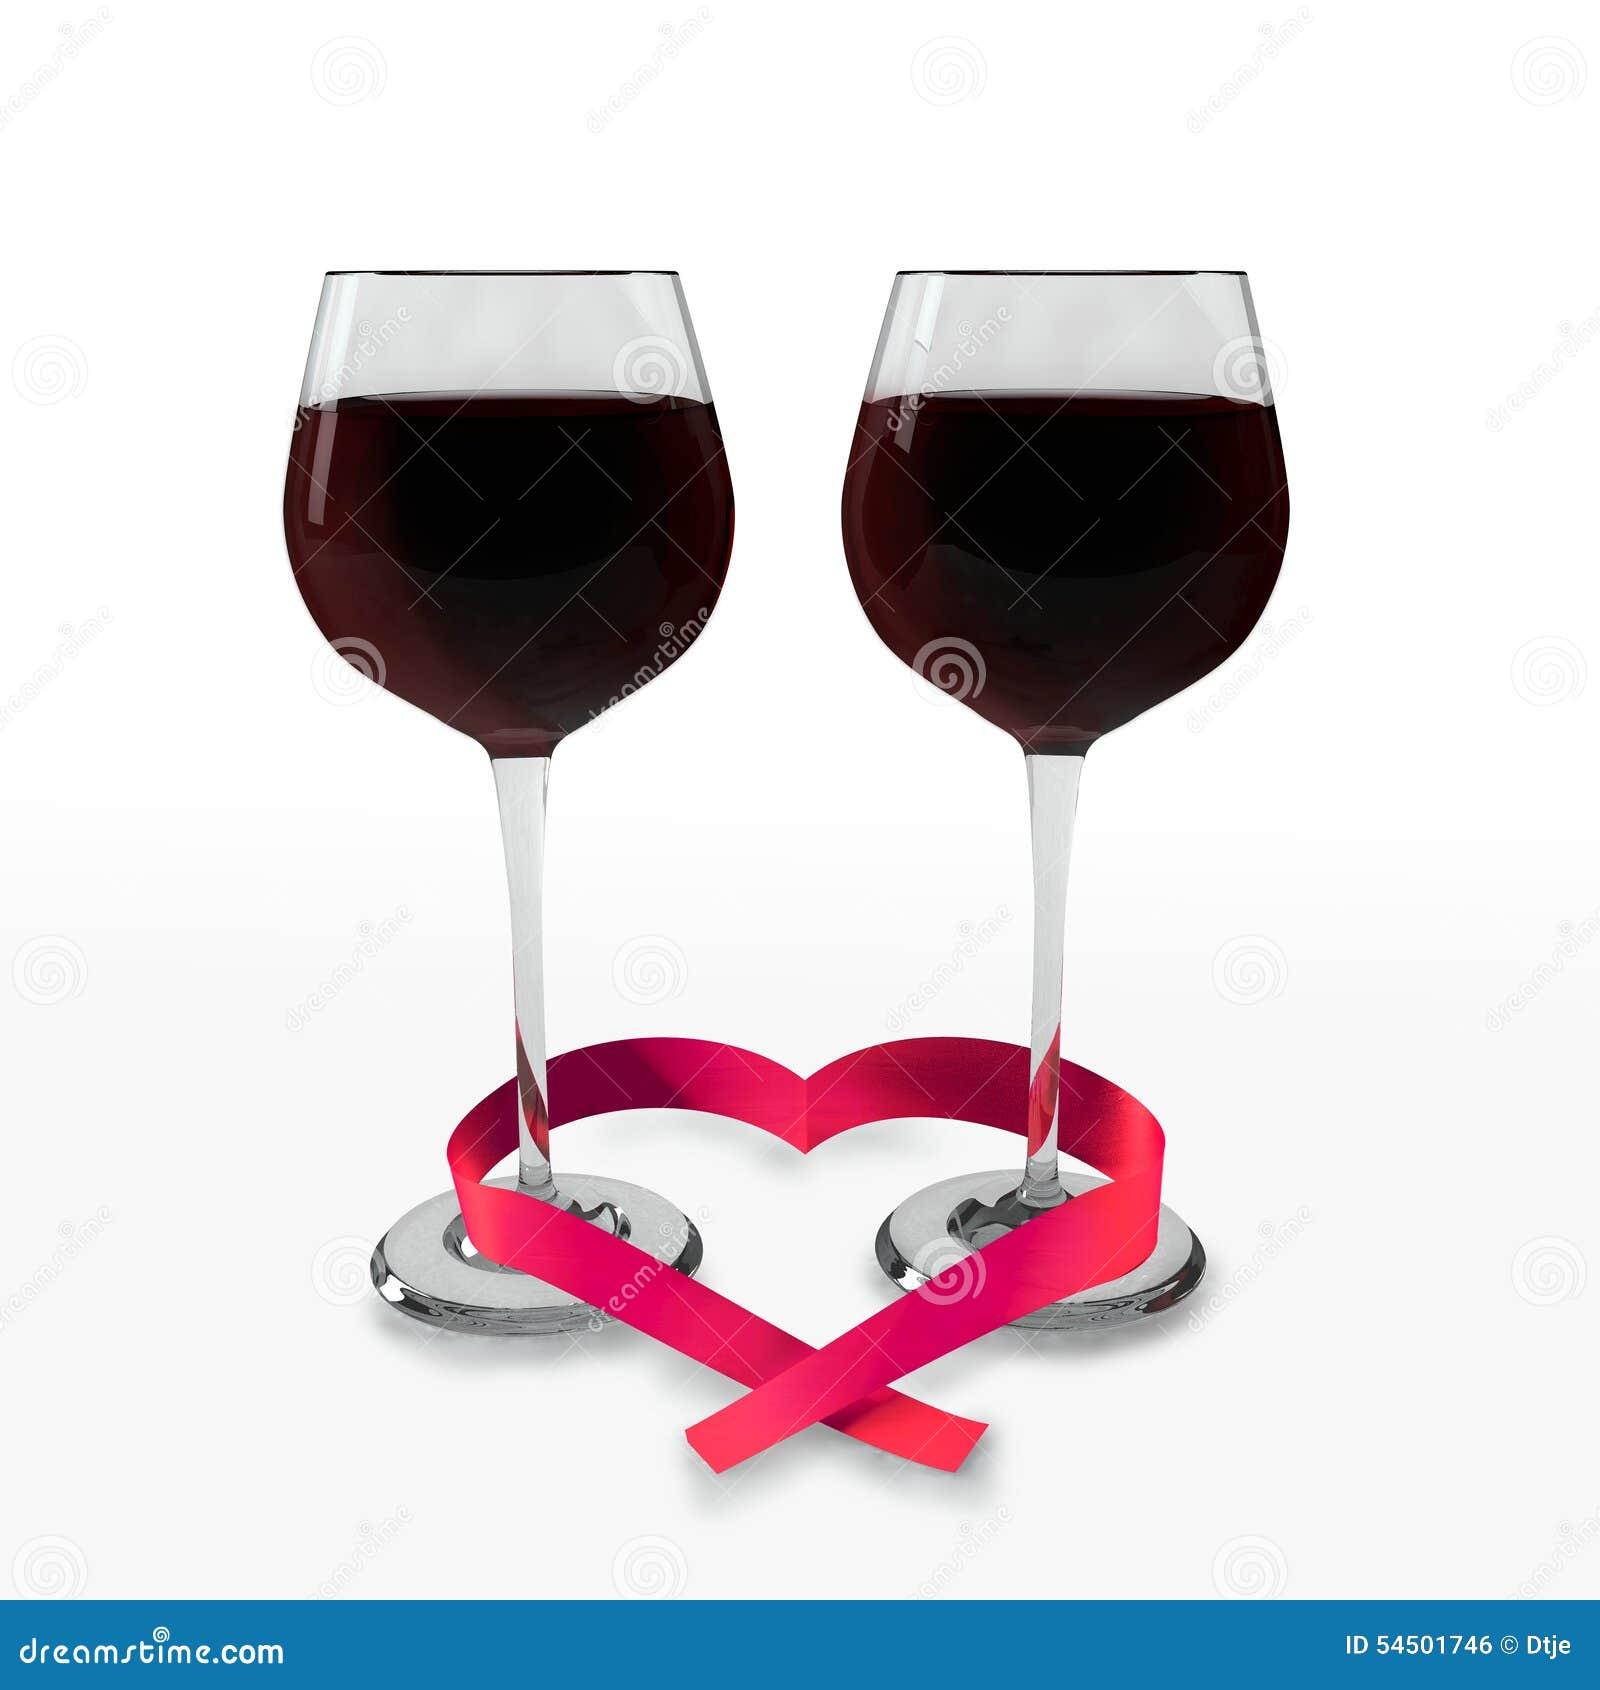 deux verres du bon vin rouge et d 39 un ruban en forme de coeur illustration stock illustration. Black Bedroom Furniture Sets. Home Design Ideas